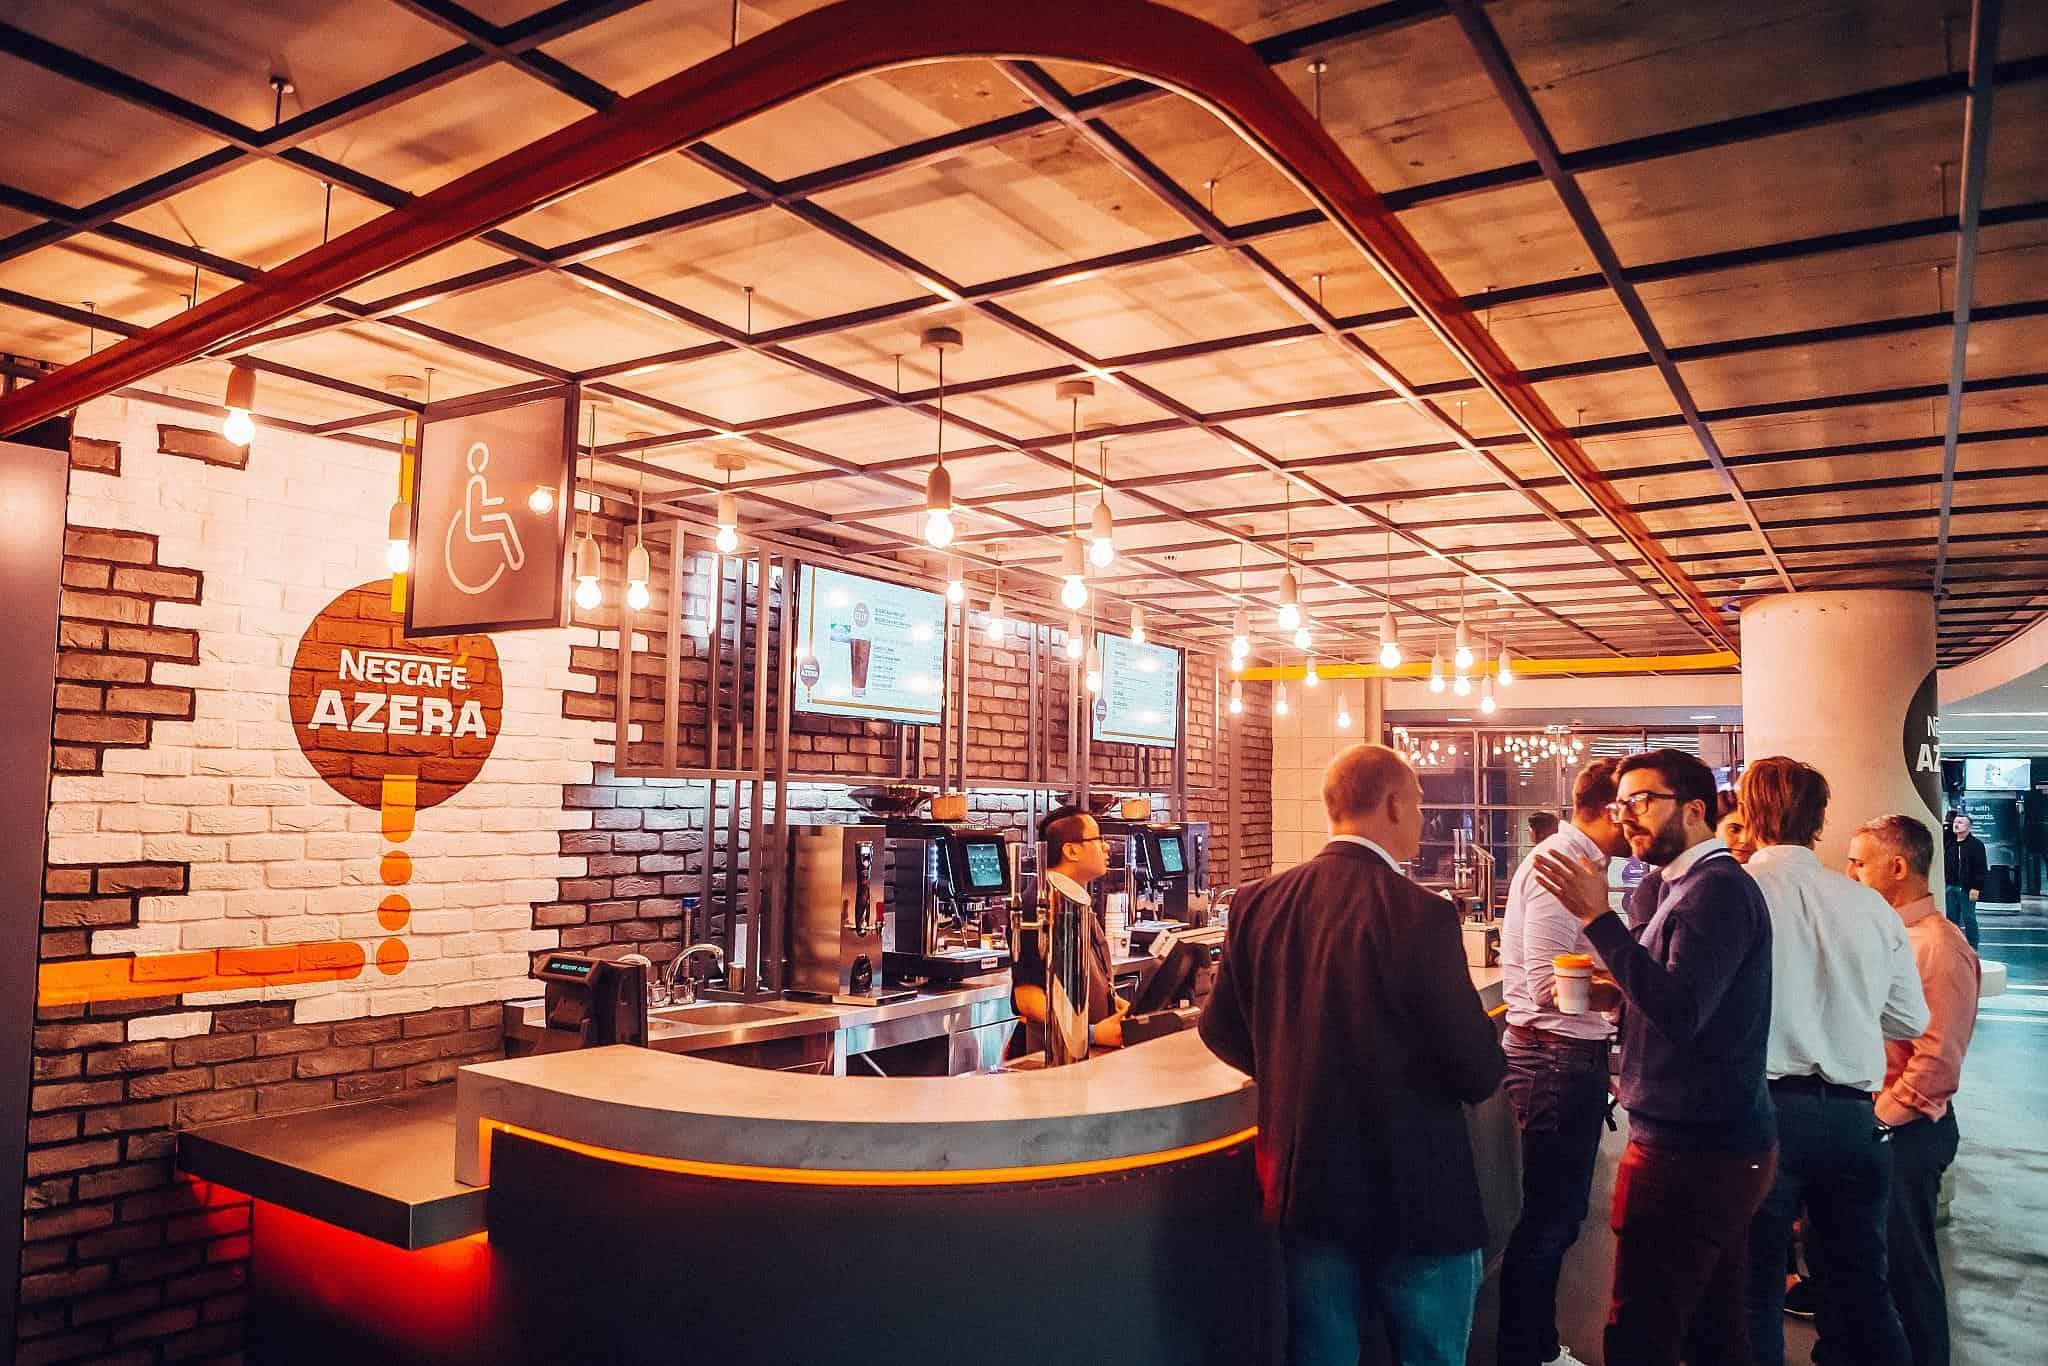 The O2, Nescafe Azera Coffee Shop